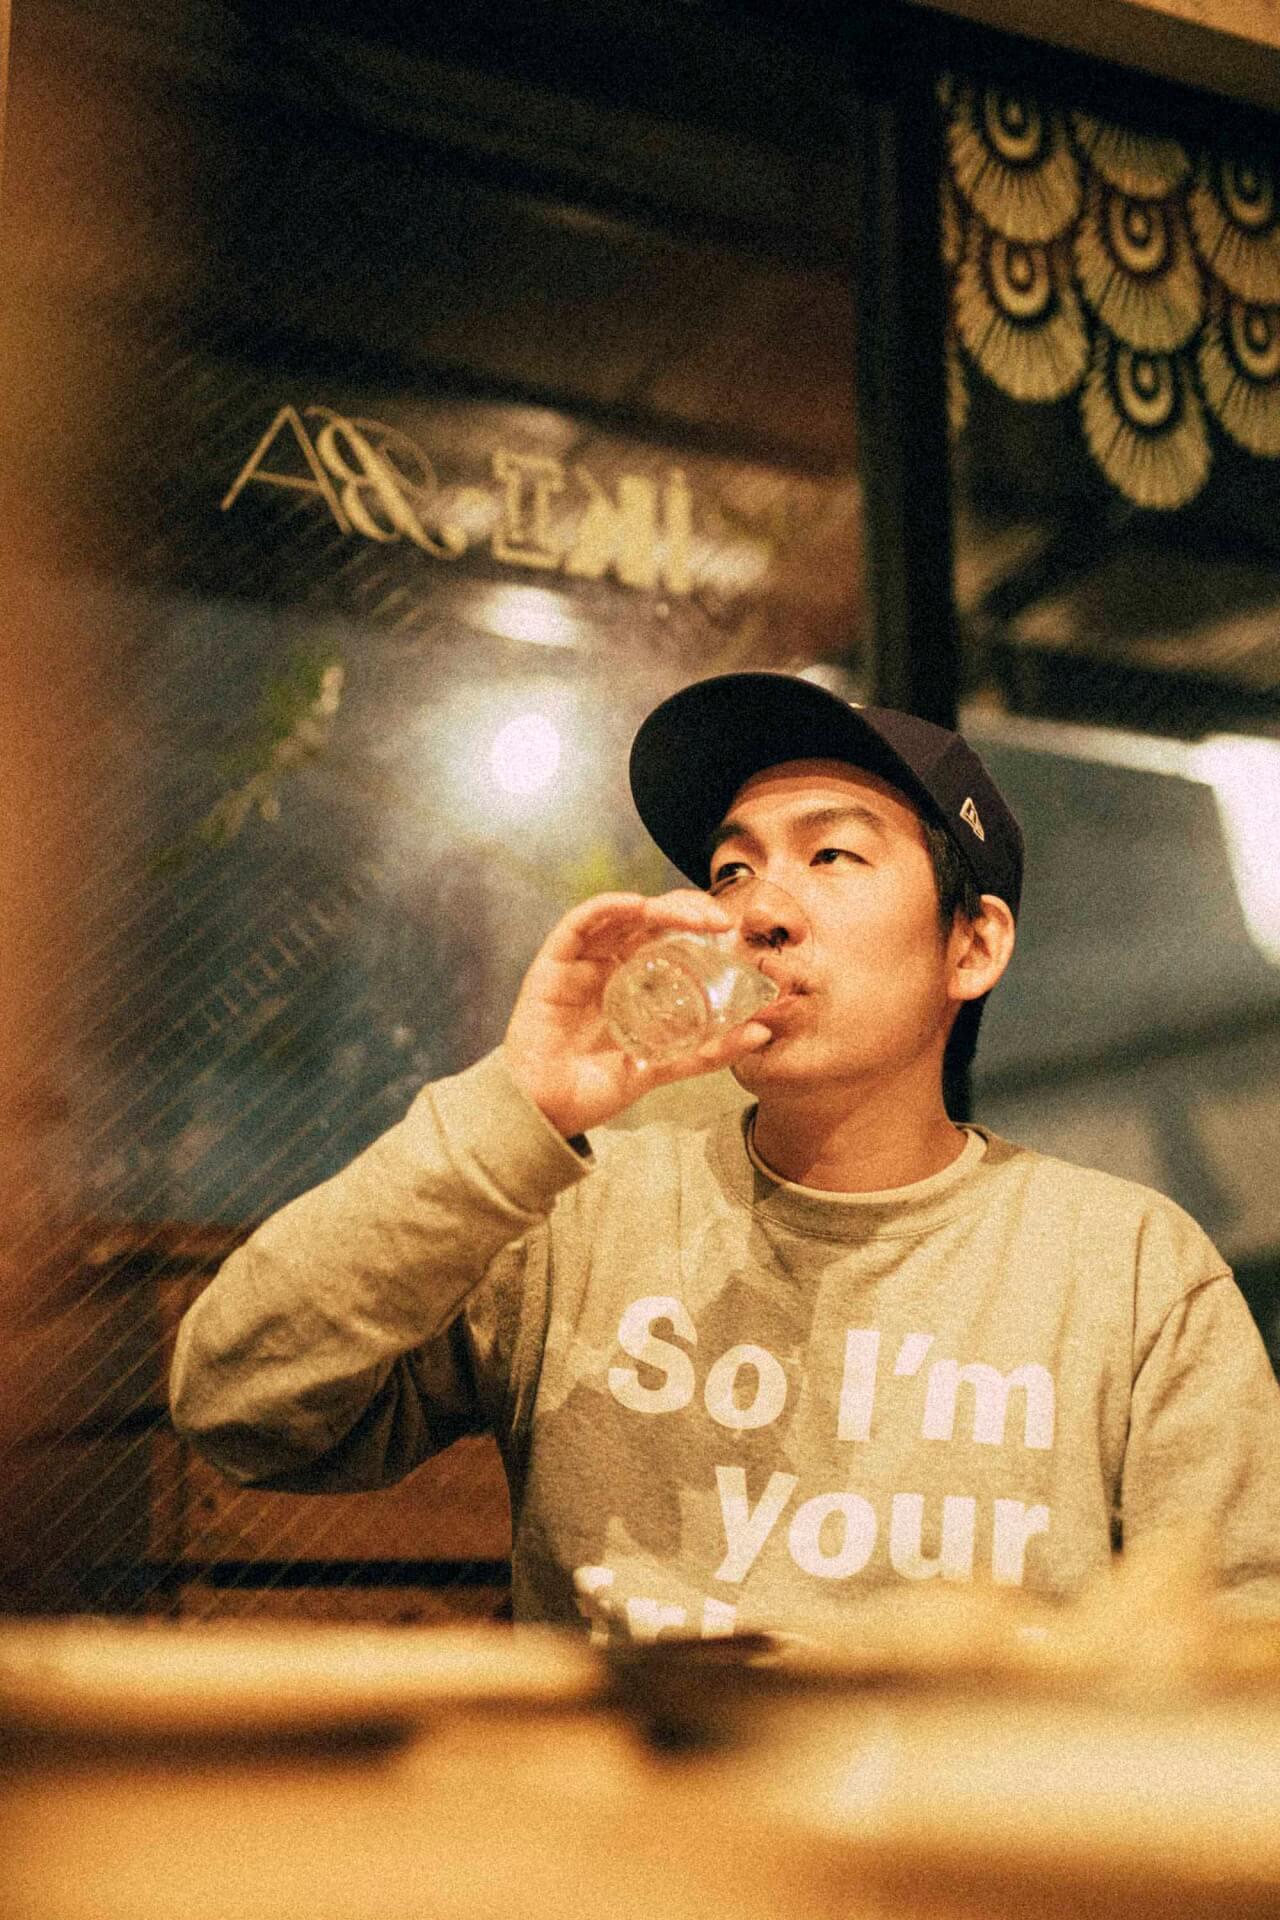 "So I'm Your Friend ―― 原島""ど真ん中""宙芳、インタヴュー interview1903-harashima-michiyoshi-5"